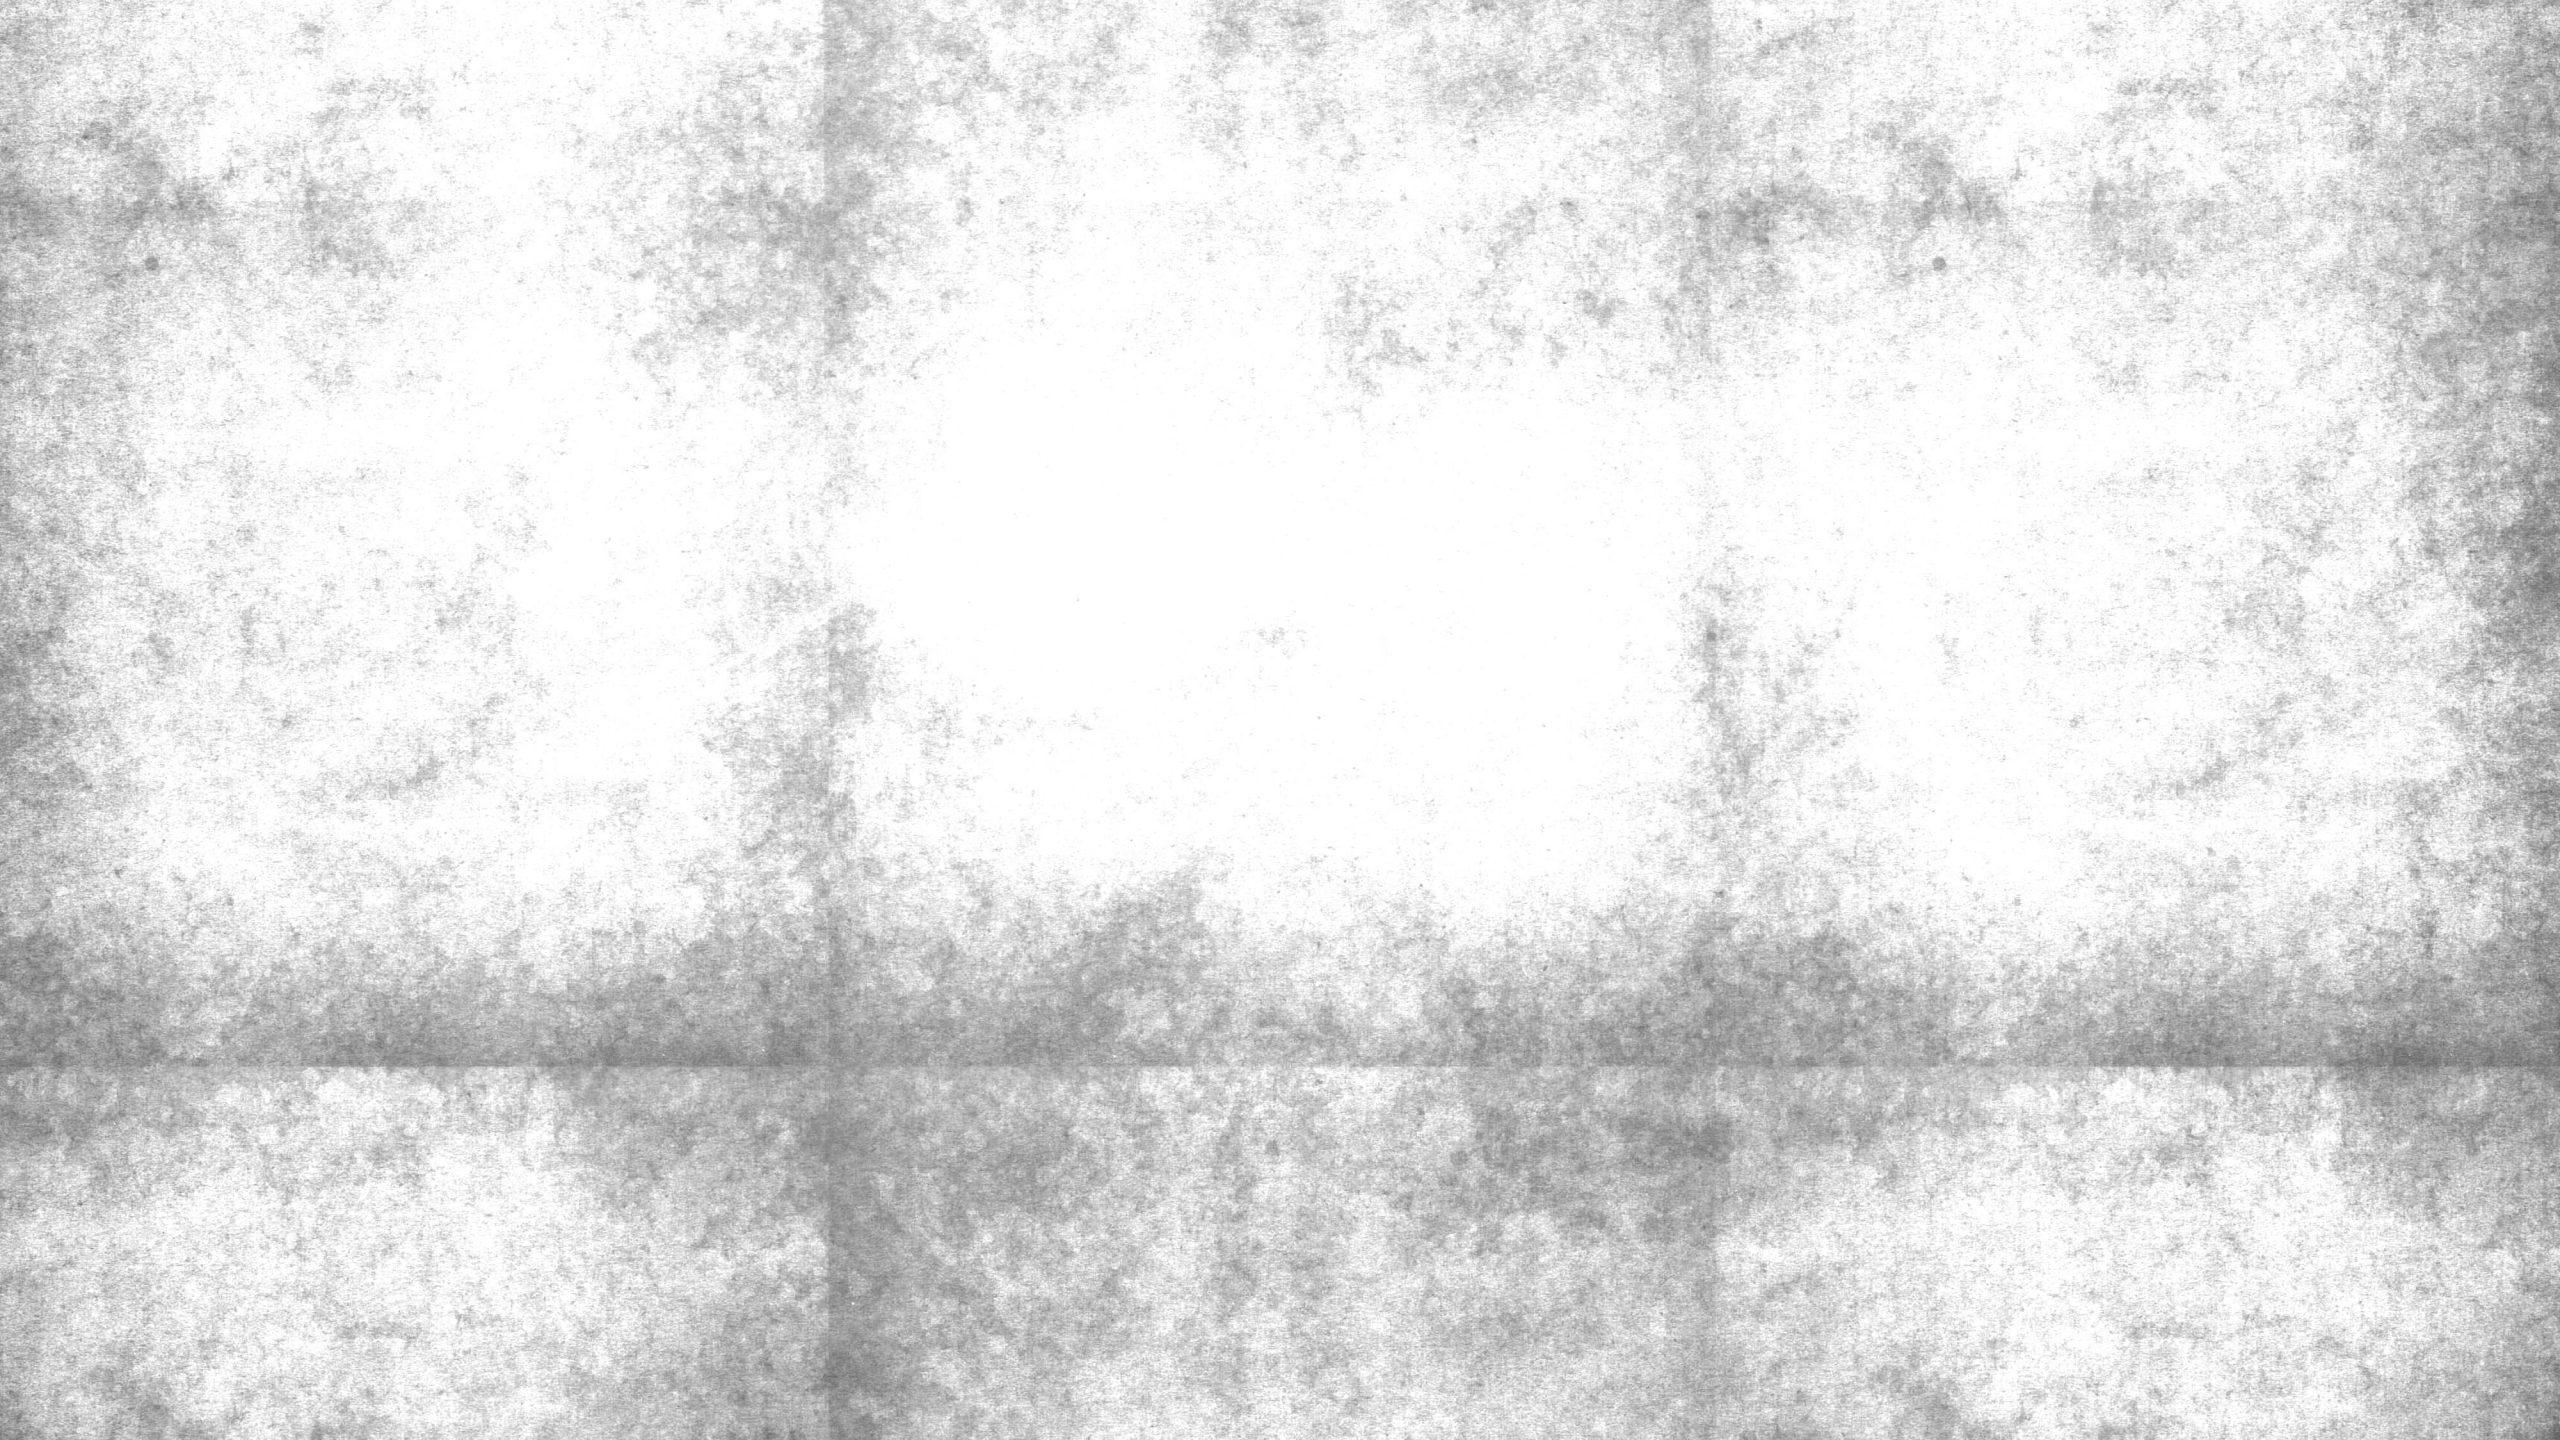 White and dark texture wallpaper